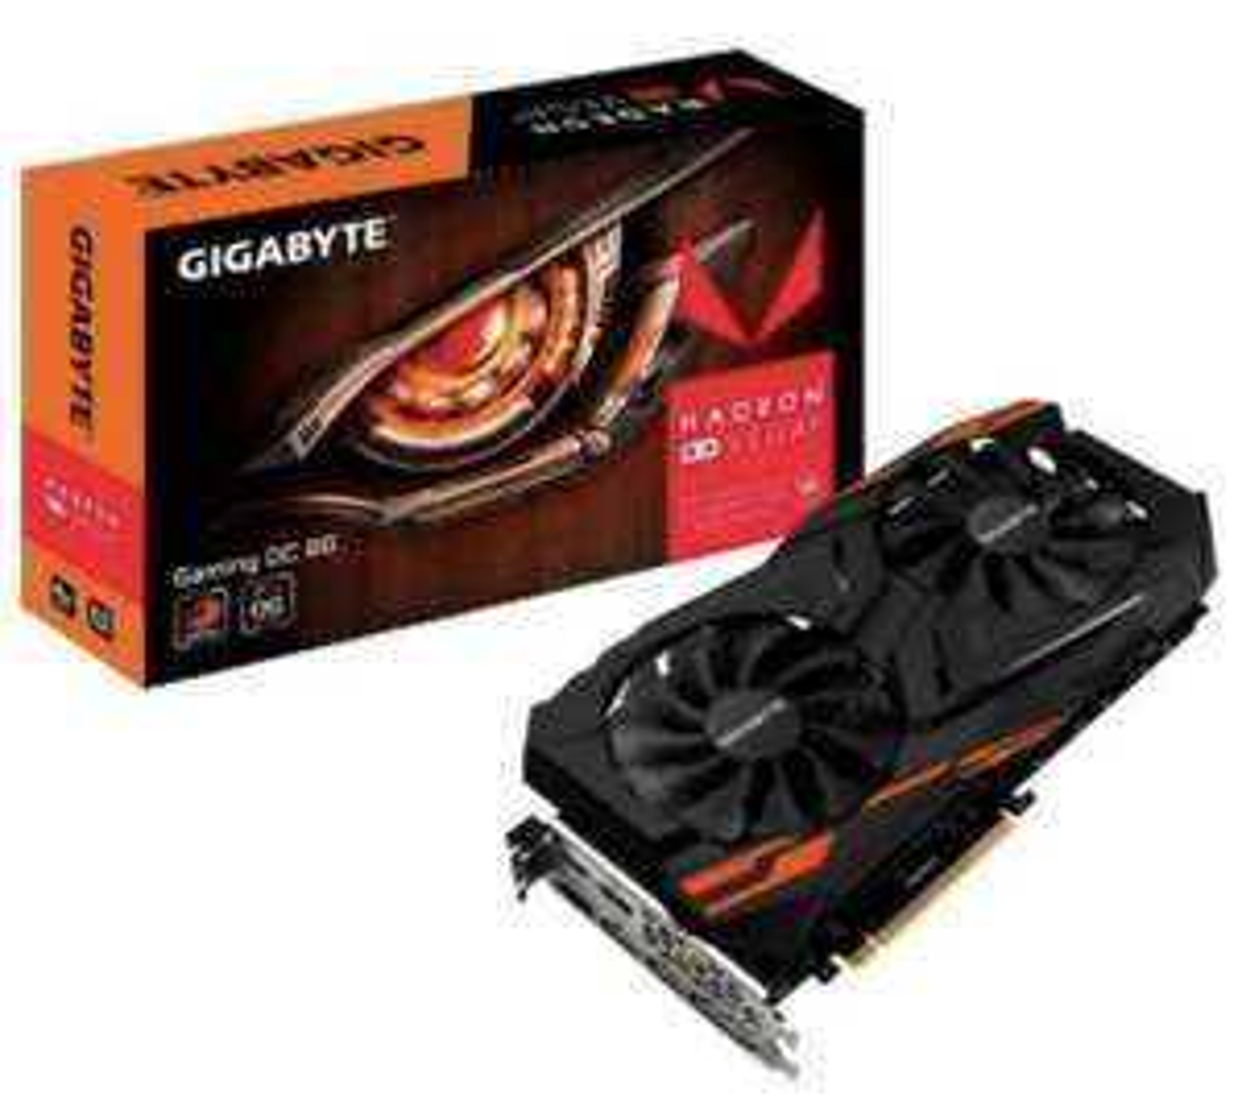 Gigabyte Radeon RX Vega 56 Gaming OC